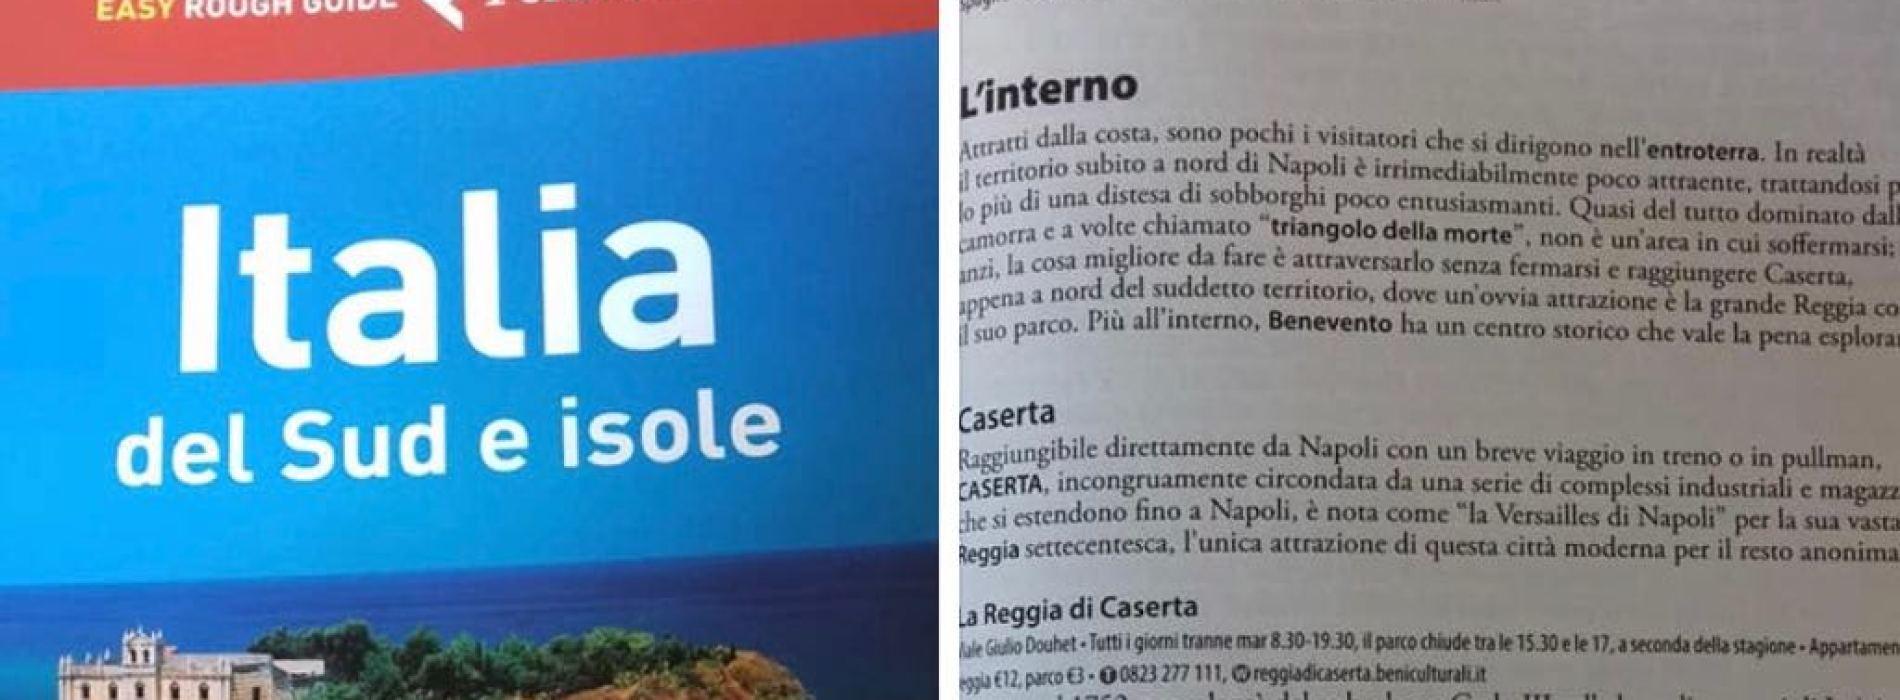 Offese a Caserta, Ondawebtv rilancia con #boicottaFeltrinelli